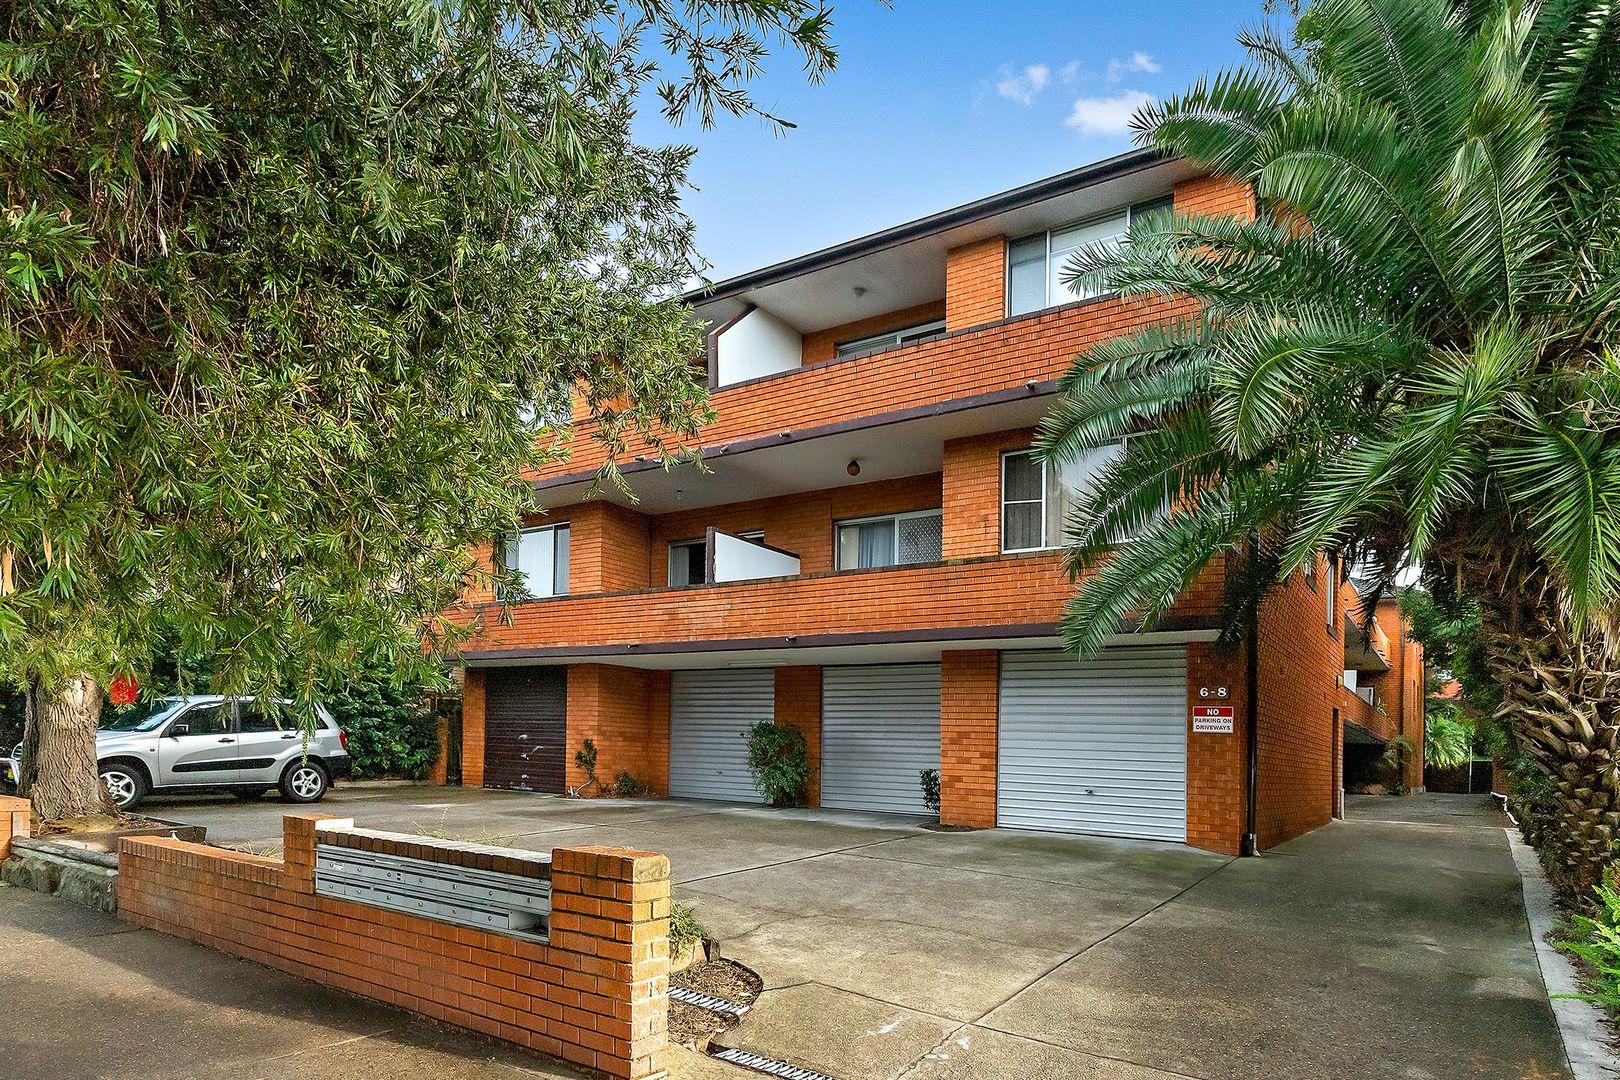 2 bedrooms Apartment / Unit / Flat in 5/6-8 Monomeeth  Street BEXLEY NSW, 2207